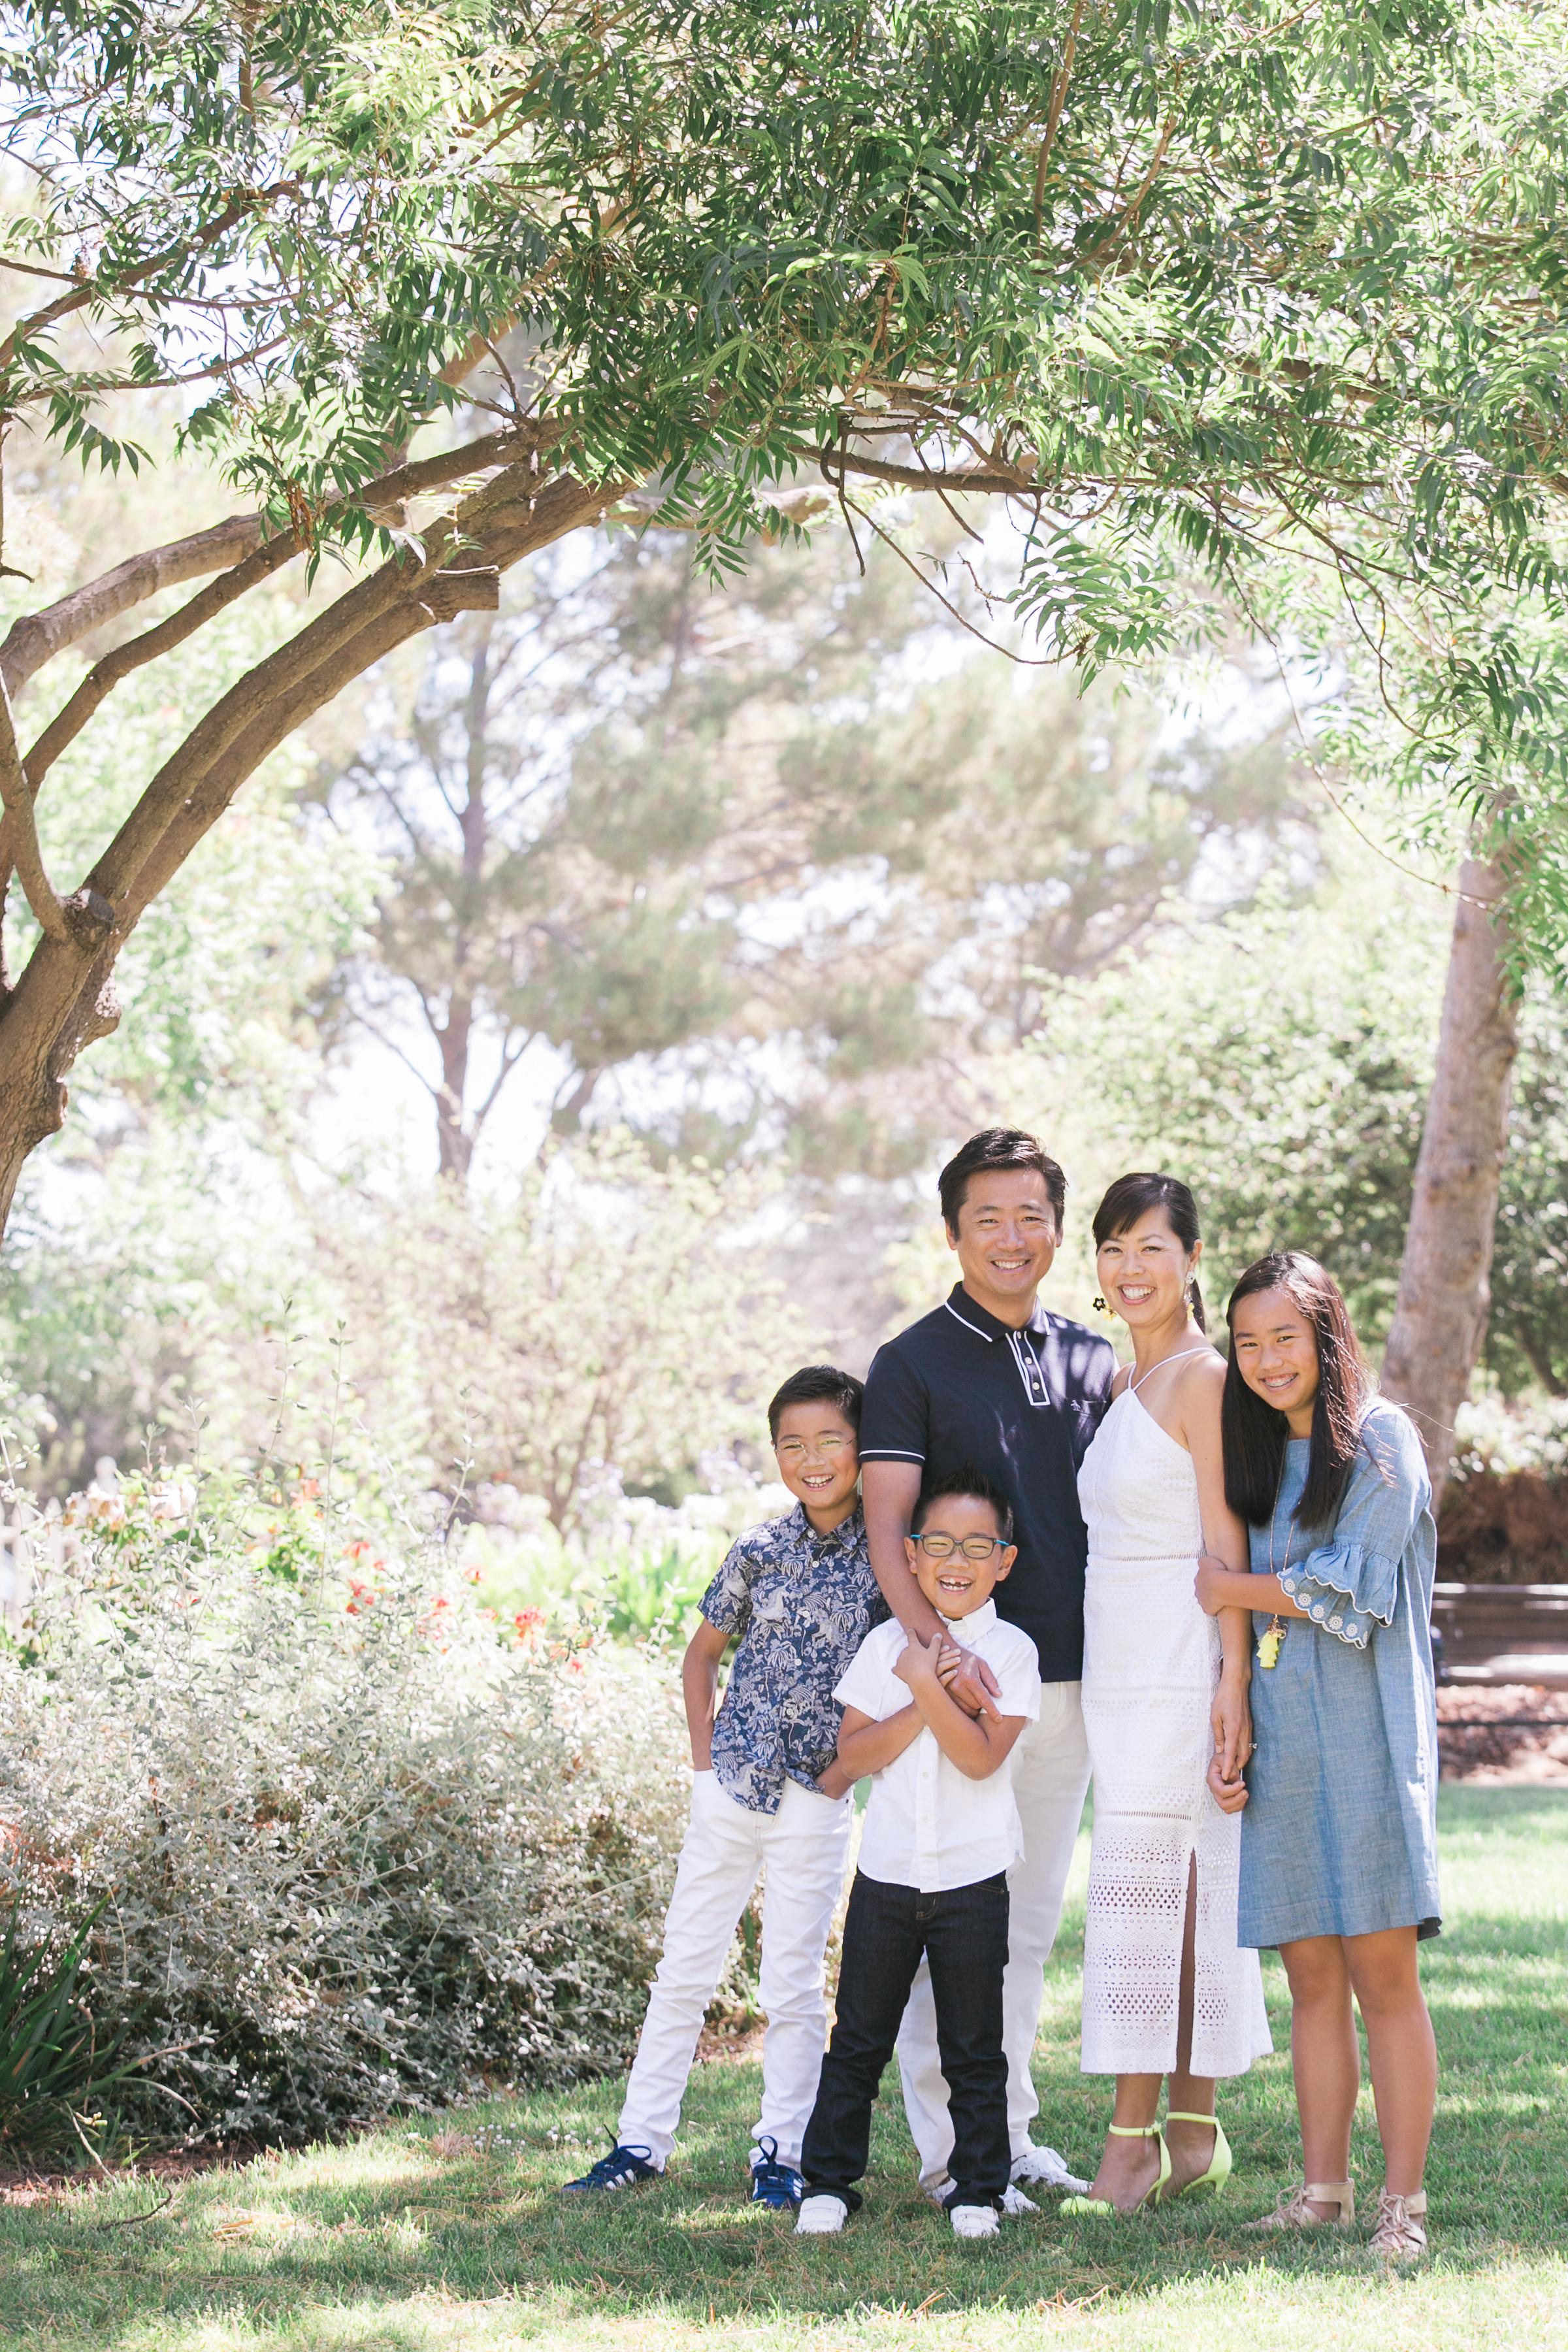 Mountain_View_Children_Family_Portrait_004.jpg